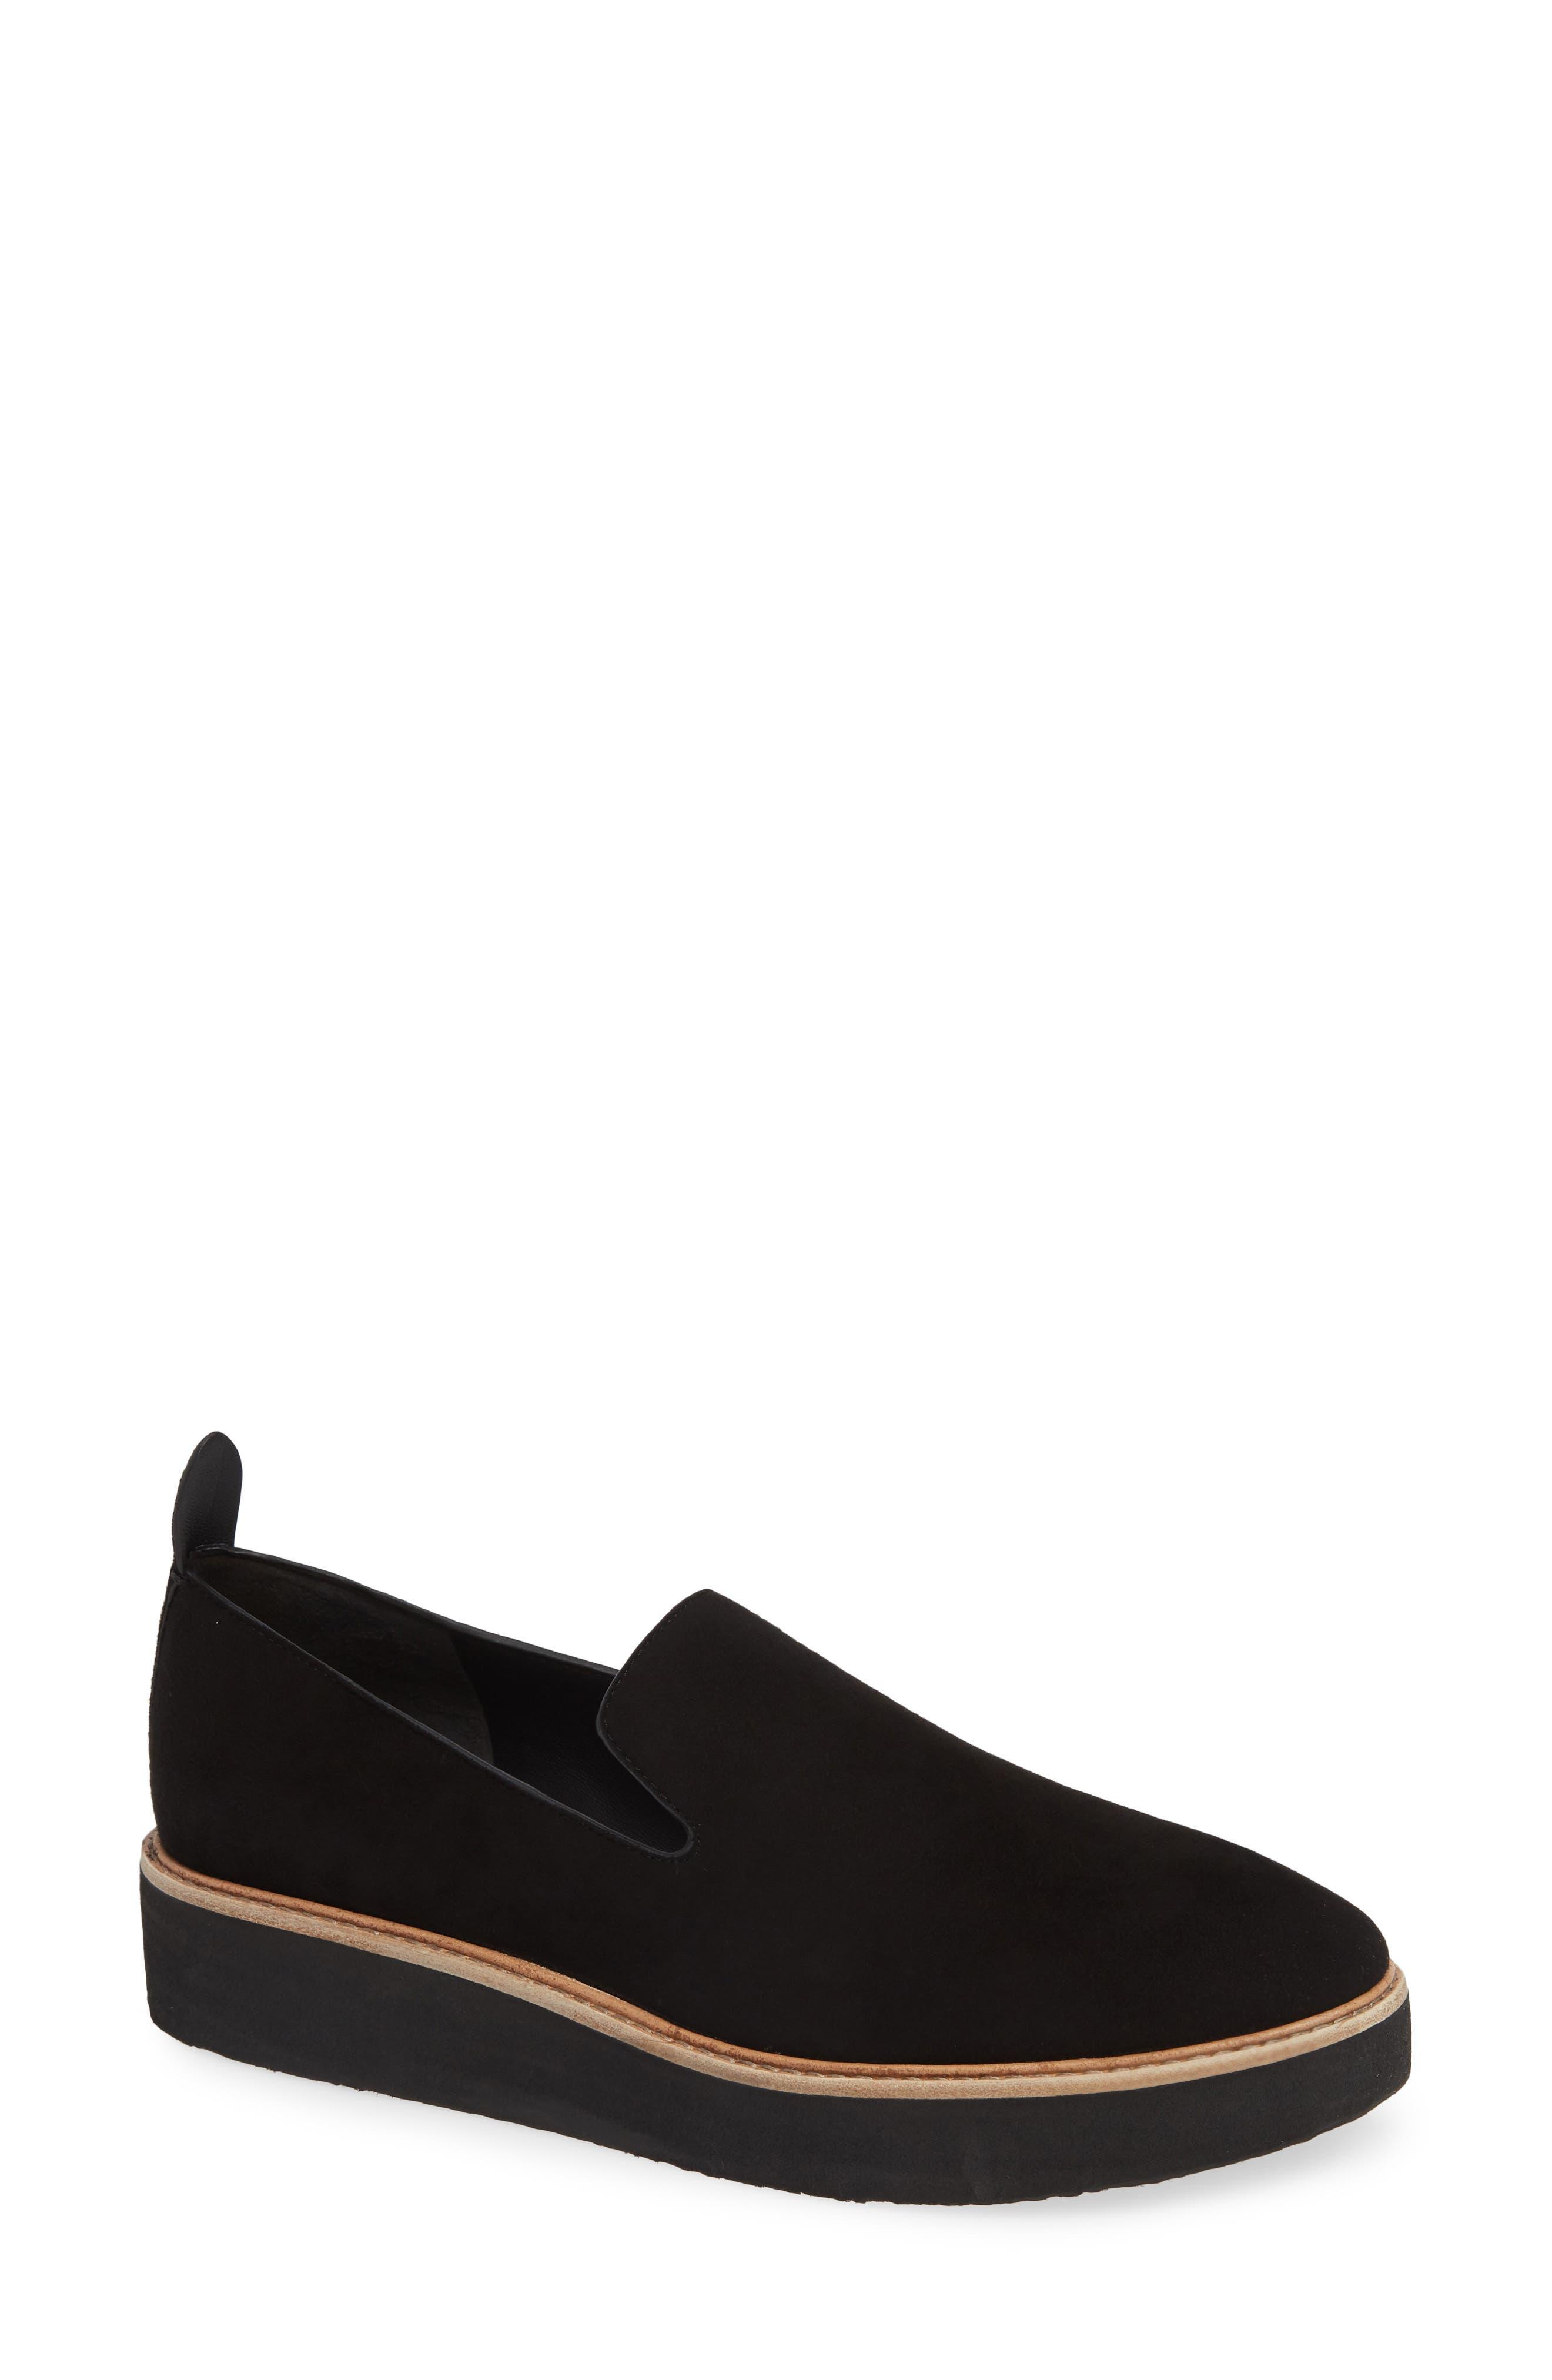 Vince   Sanders Slip-On Sneaker   HauteLook